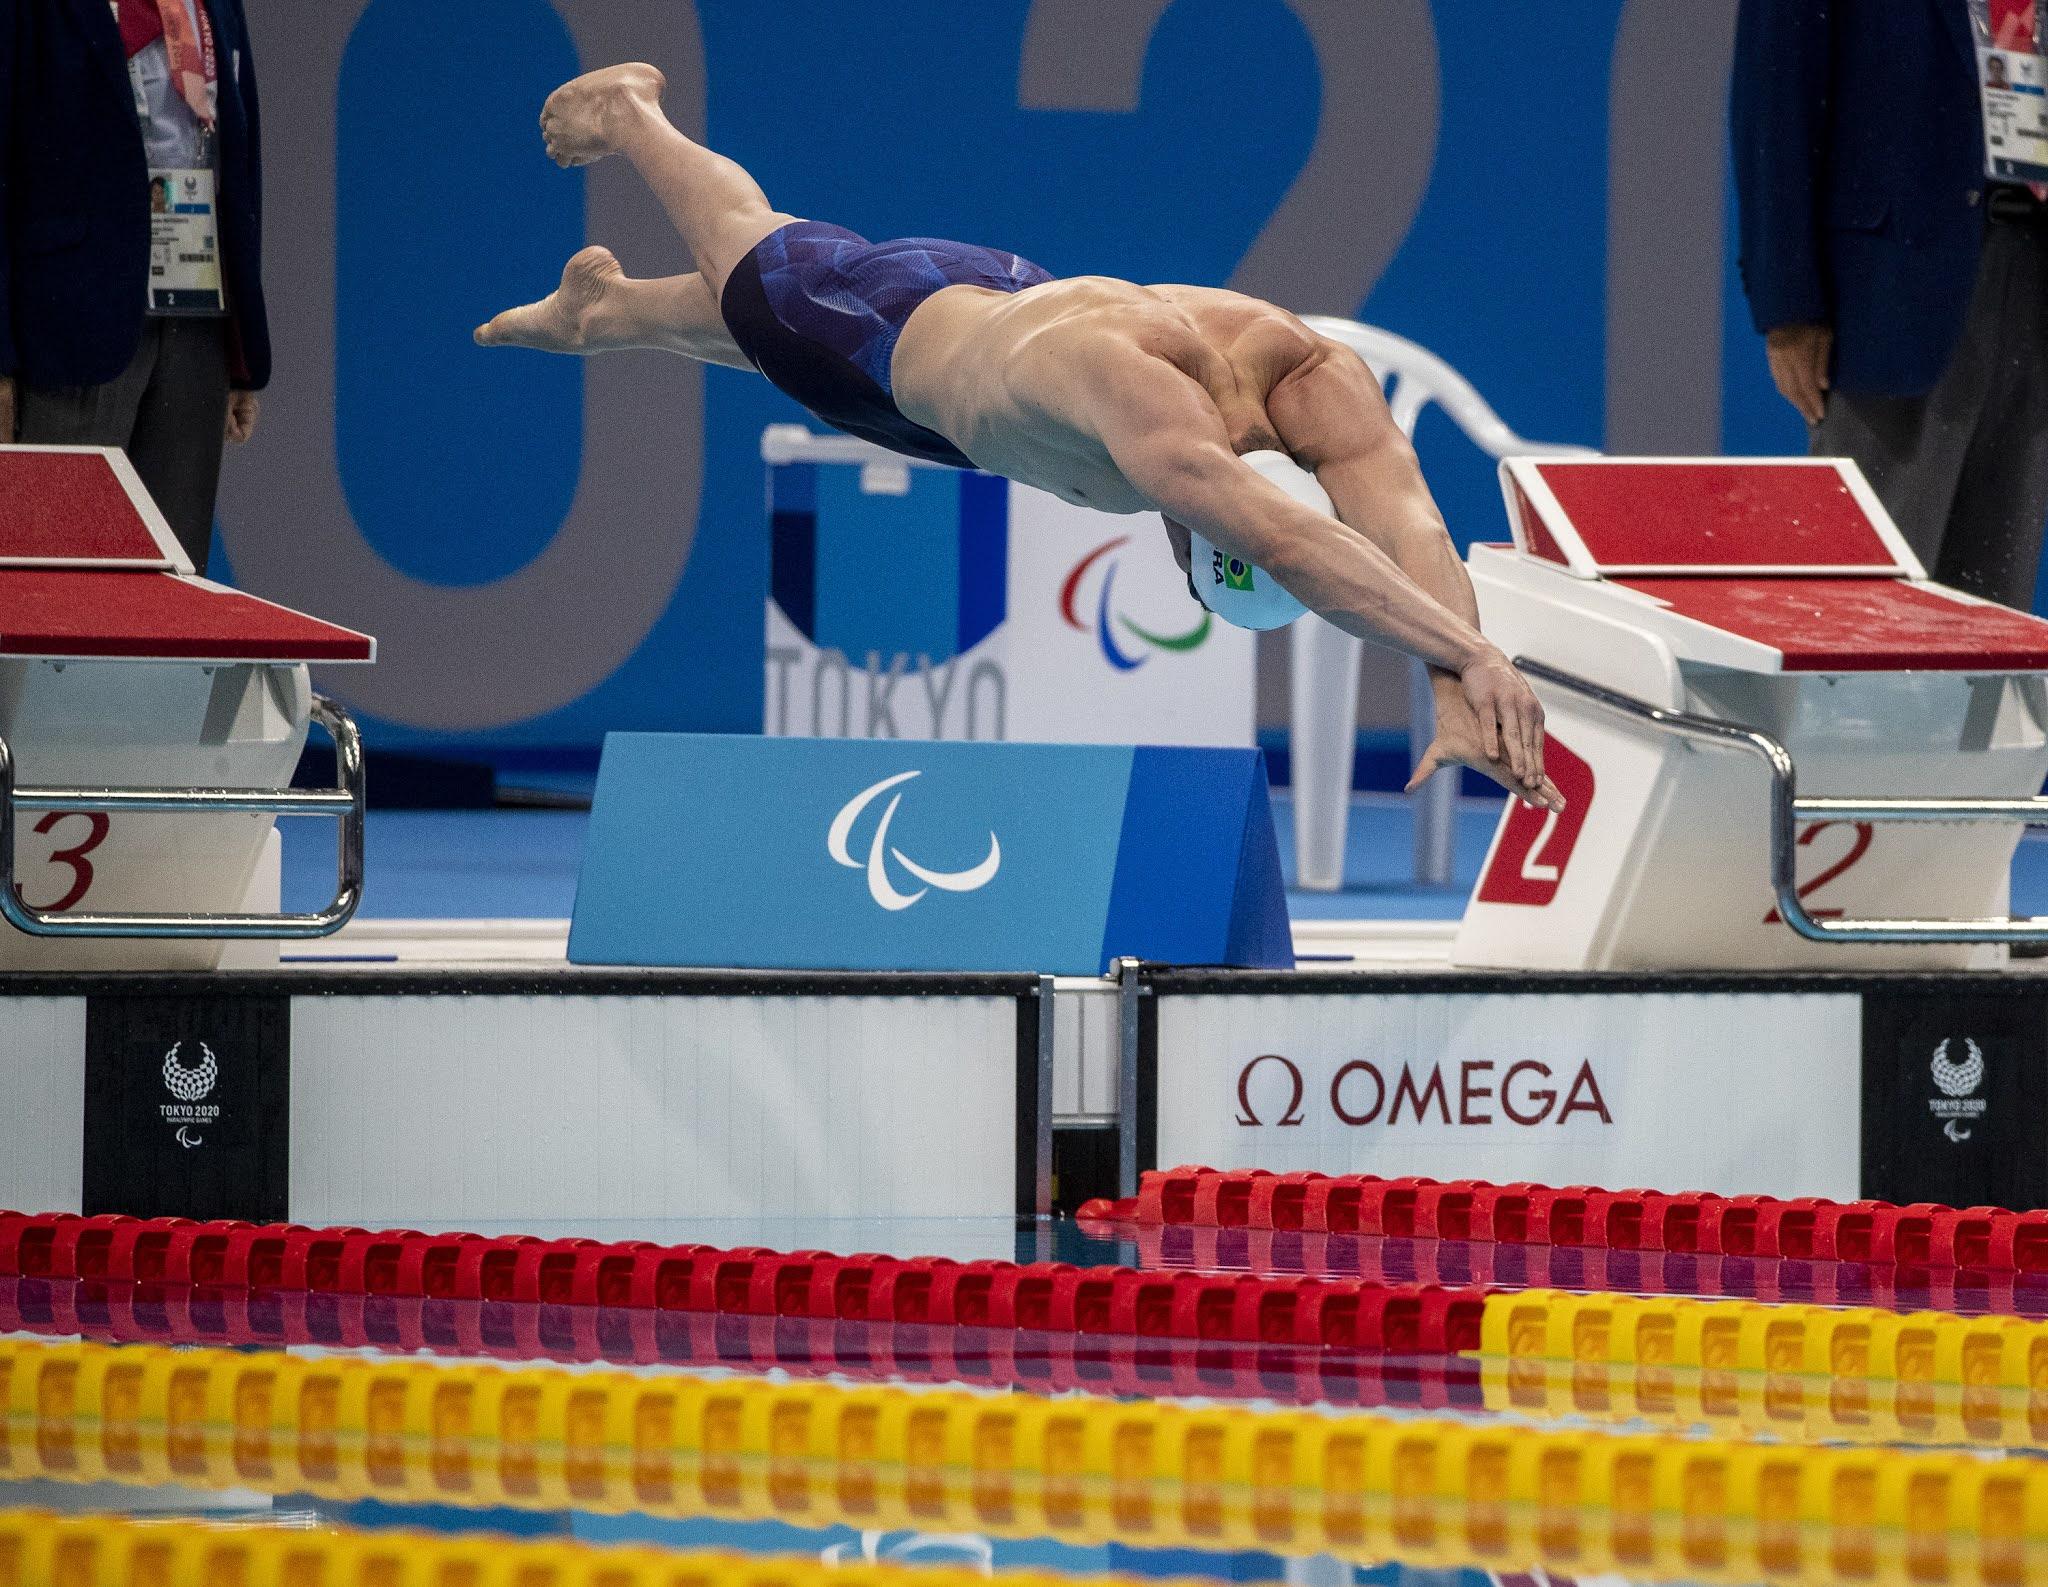 Phelipe Rodrigues salta na piscina usando bermuda azul e touca branca